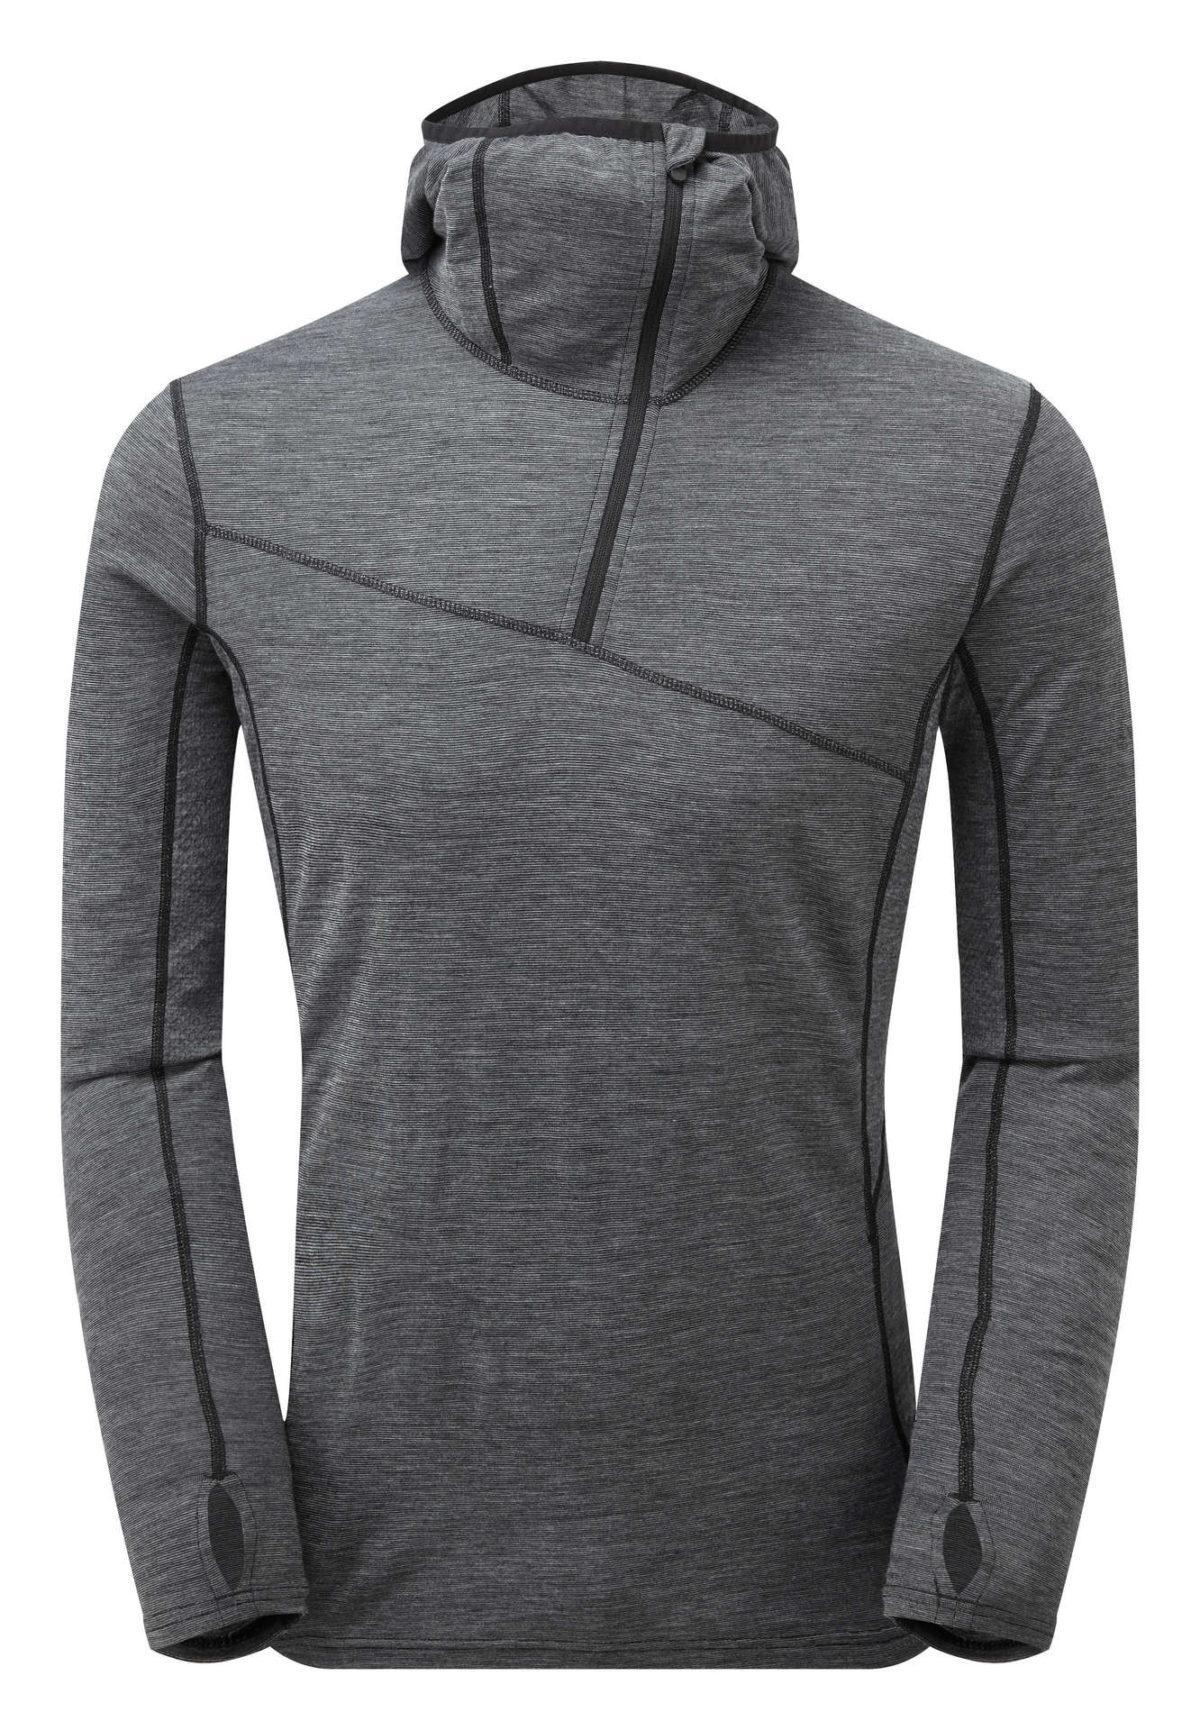 Montane merino wool and Primaloft mix hoodie top